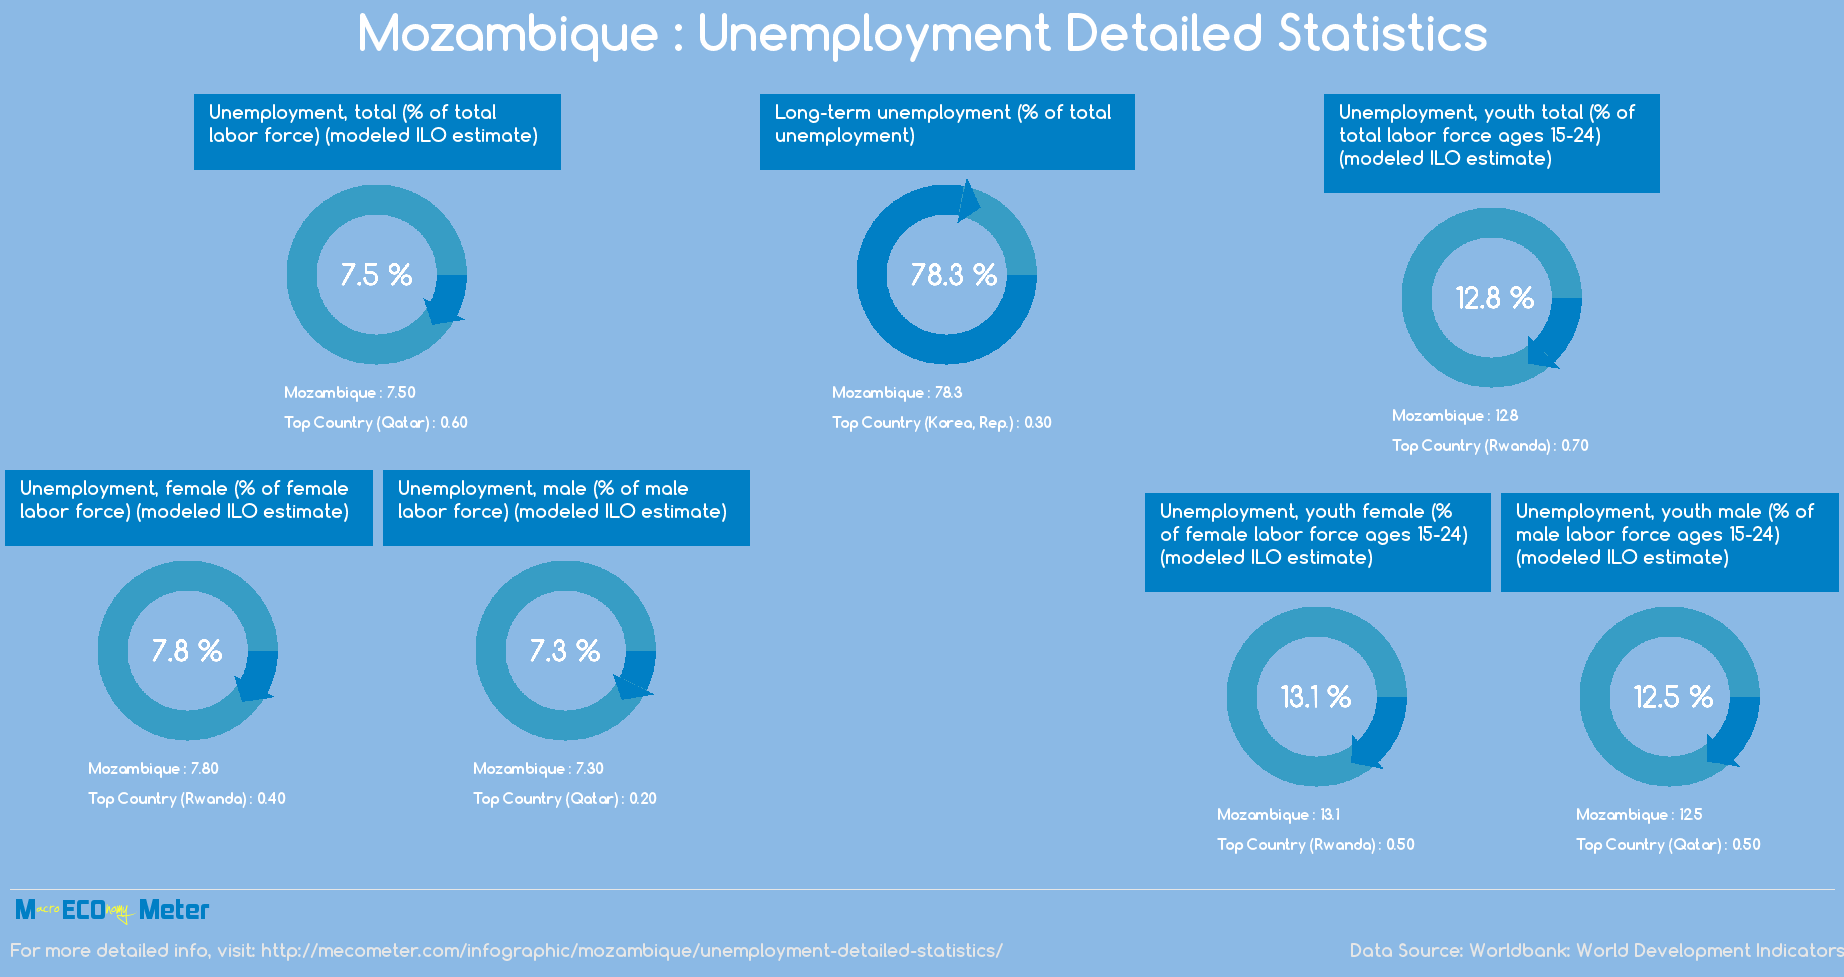 Mozambique : Unemployment Detailed Statistics